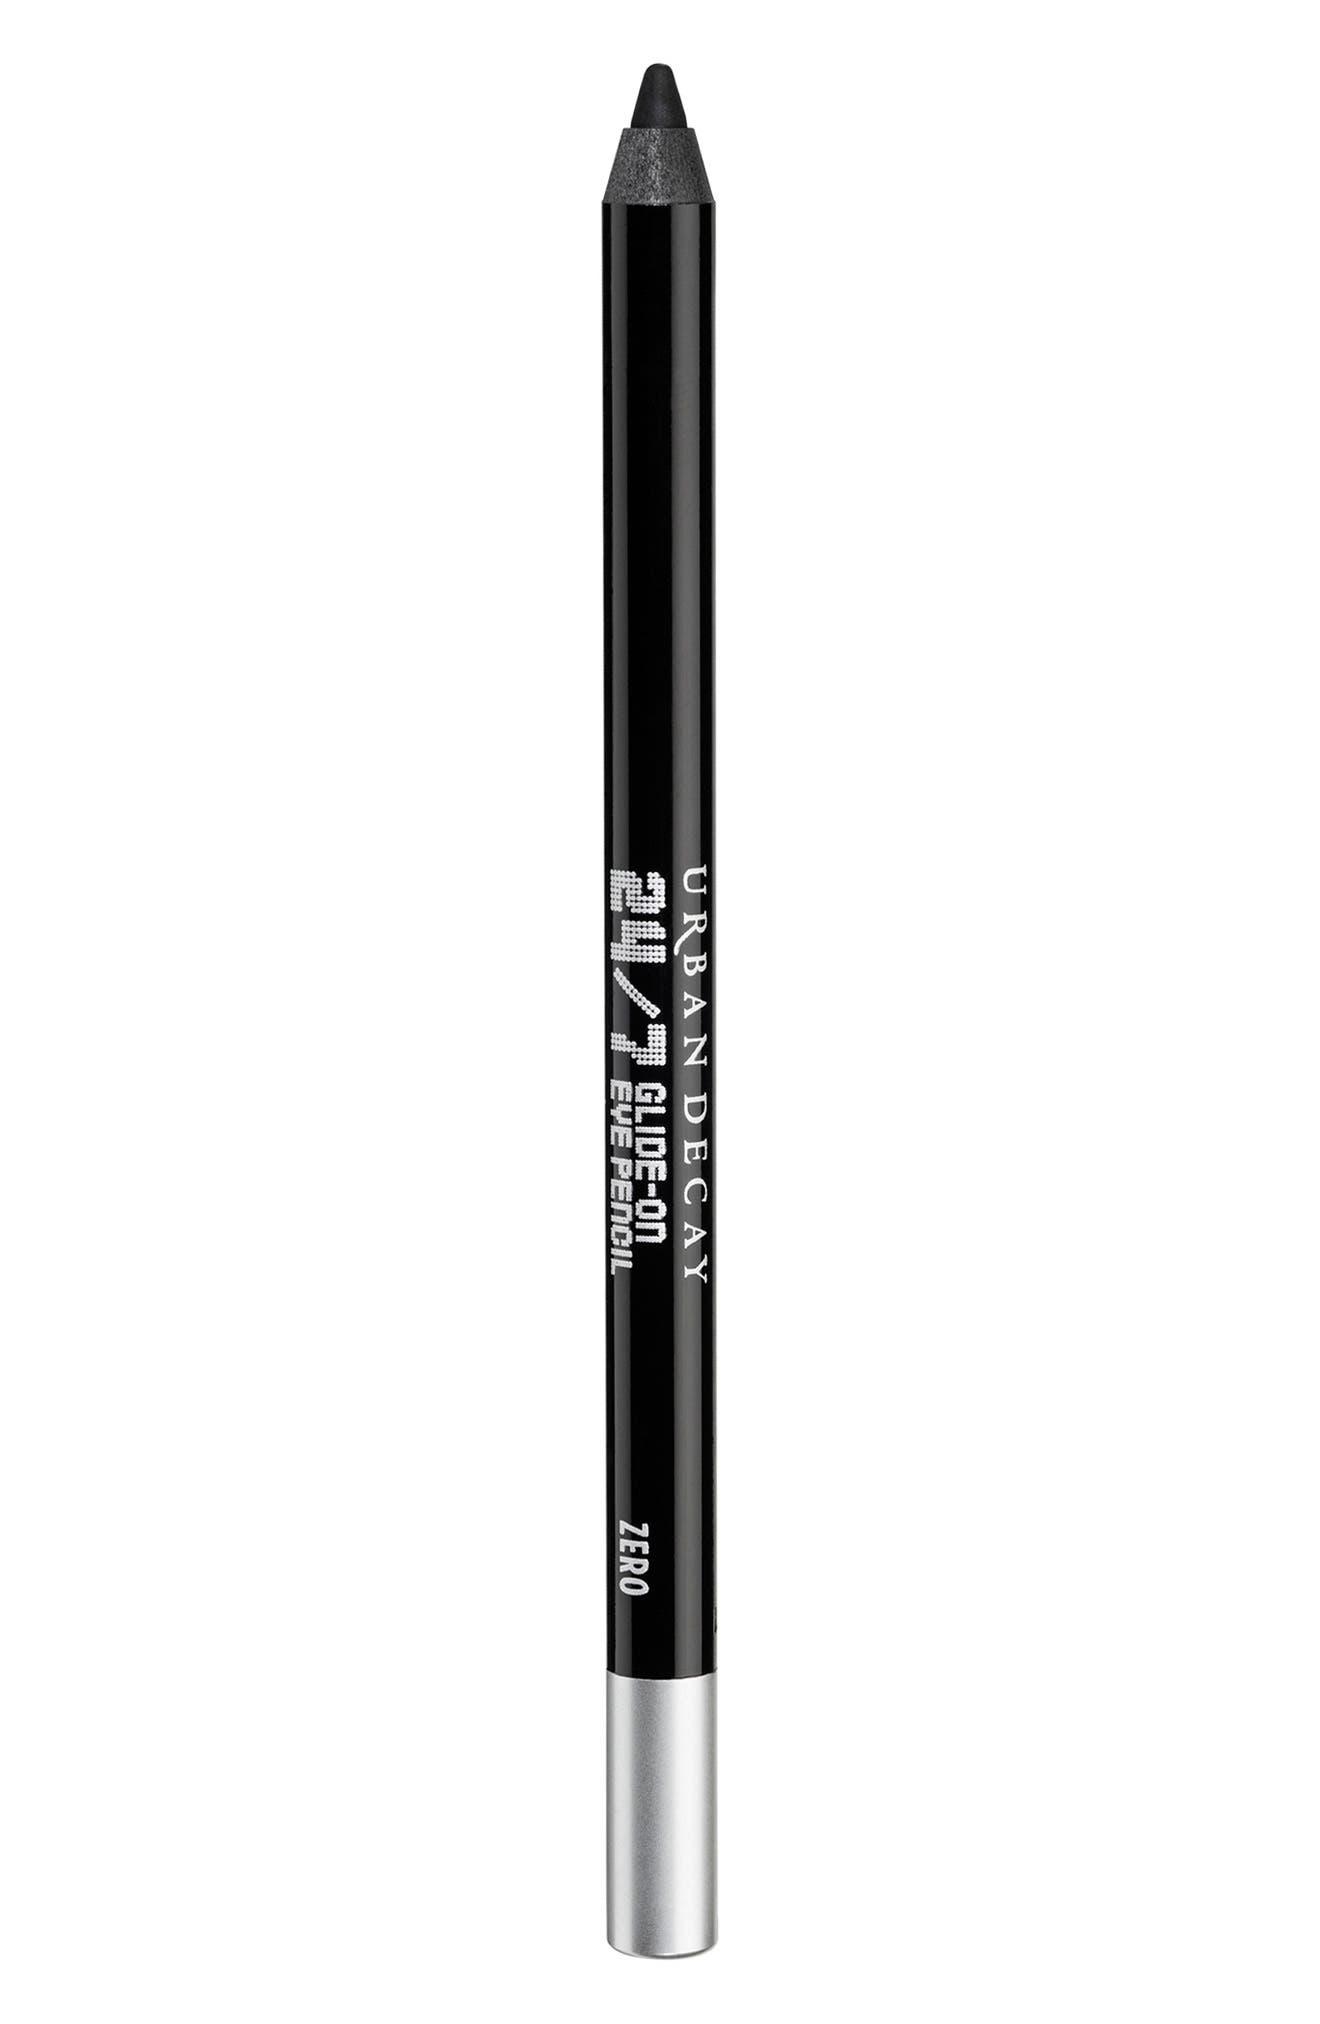 24/7 Glide-On Eye Pencil,                             Main thumbnail 1, color,                             ZERO